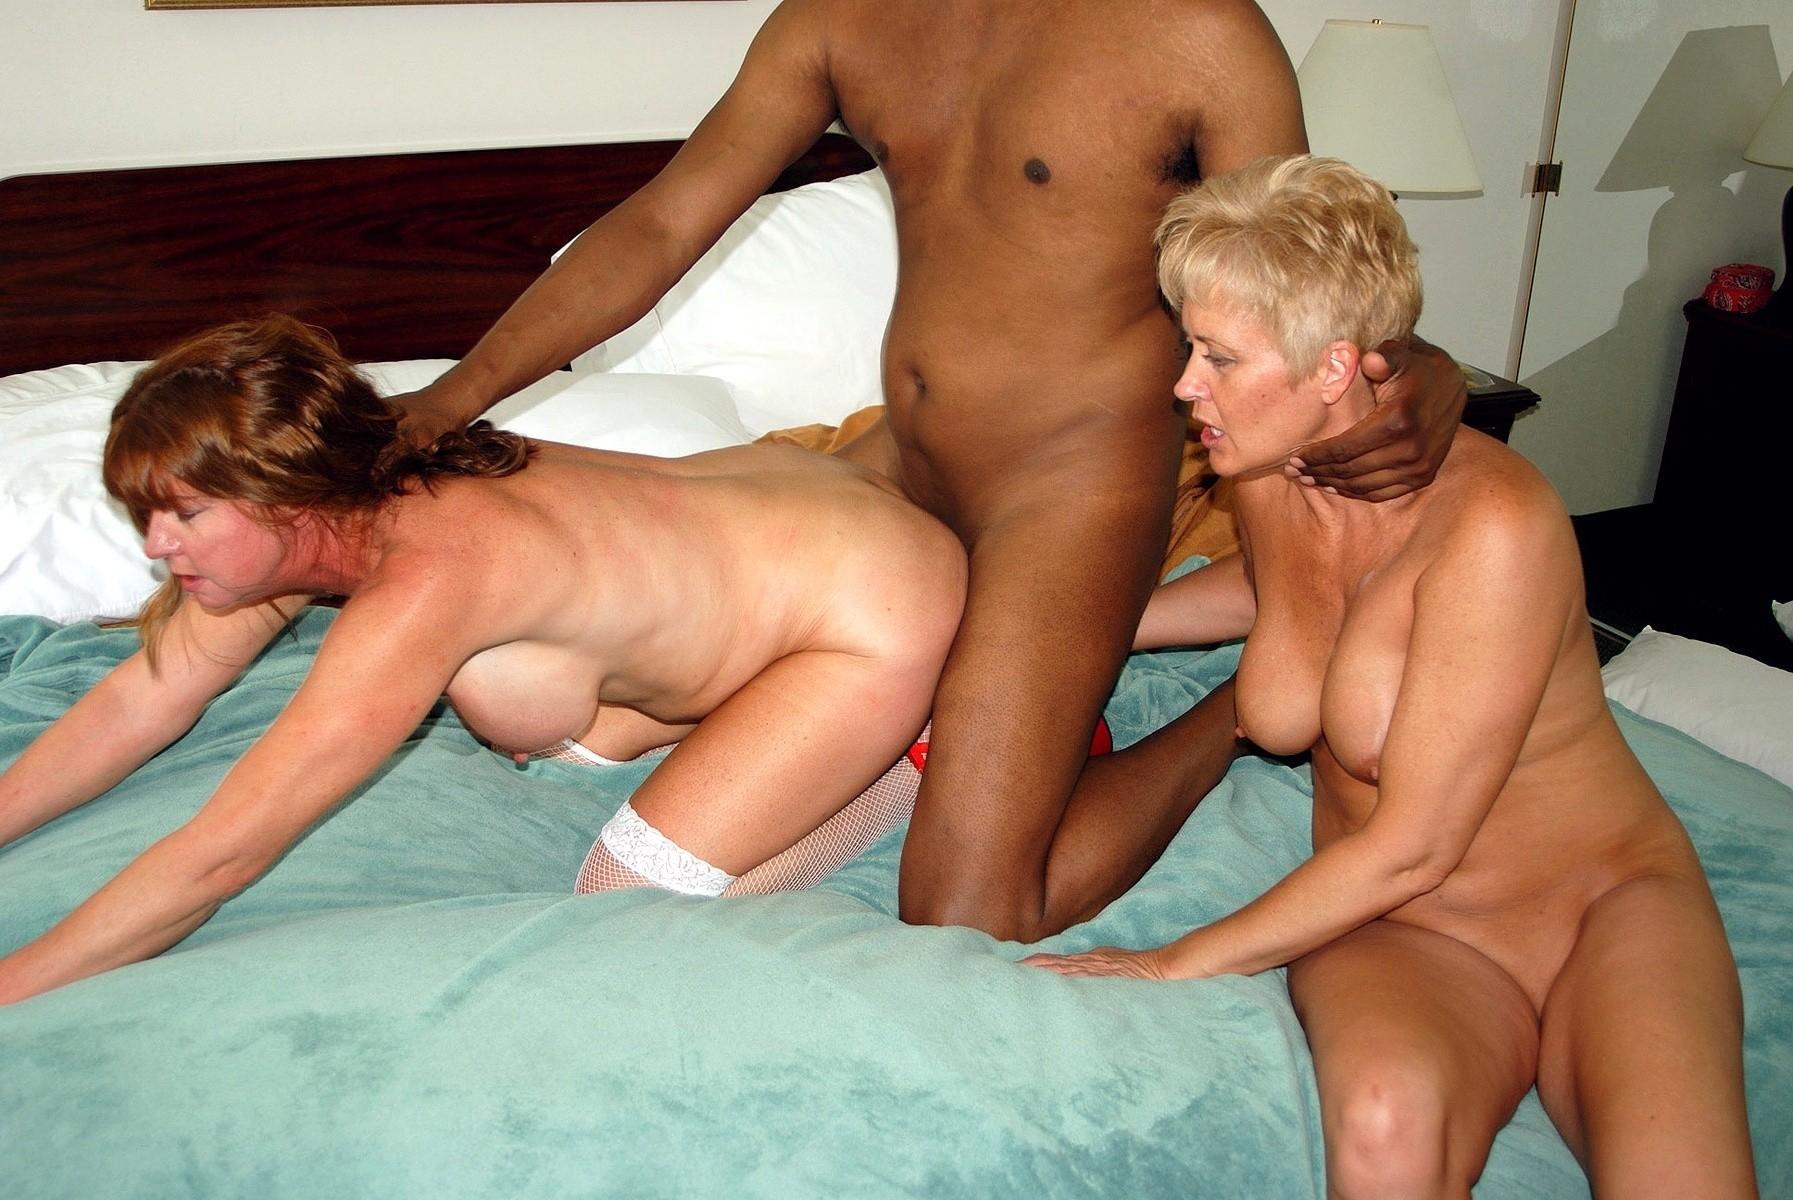 Mature women sex threesome labia